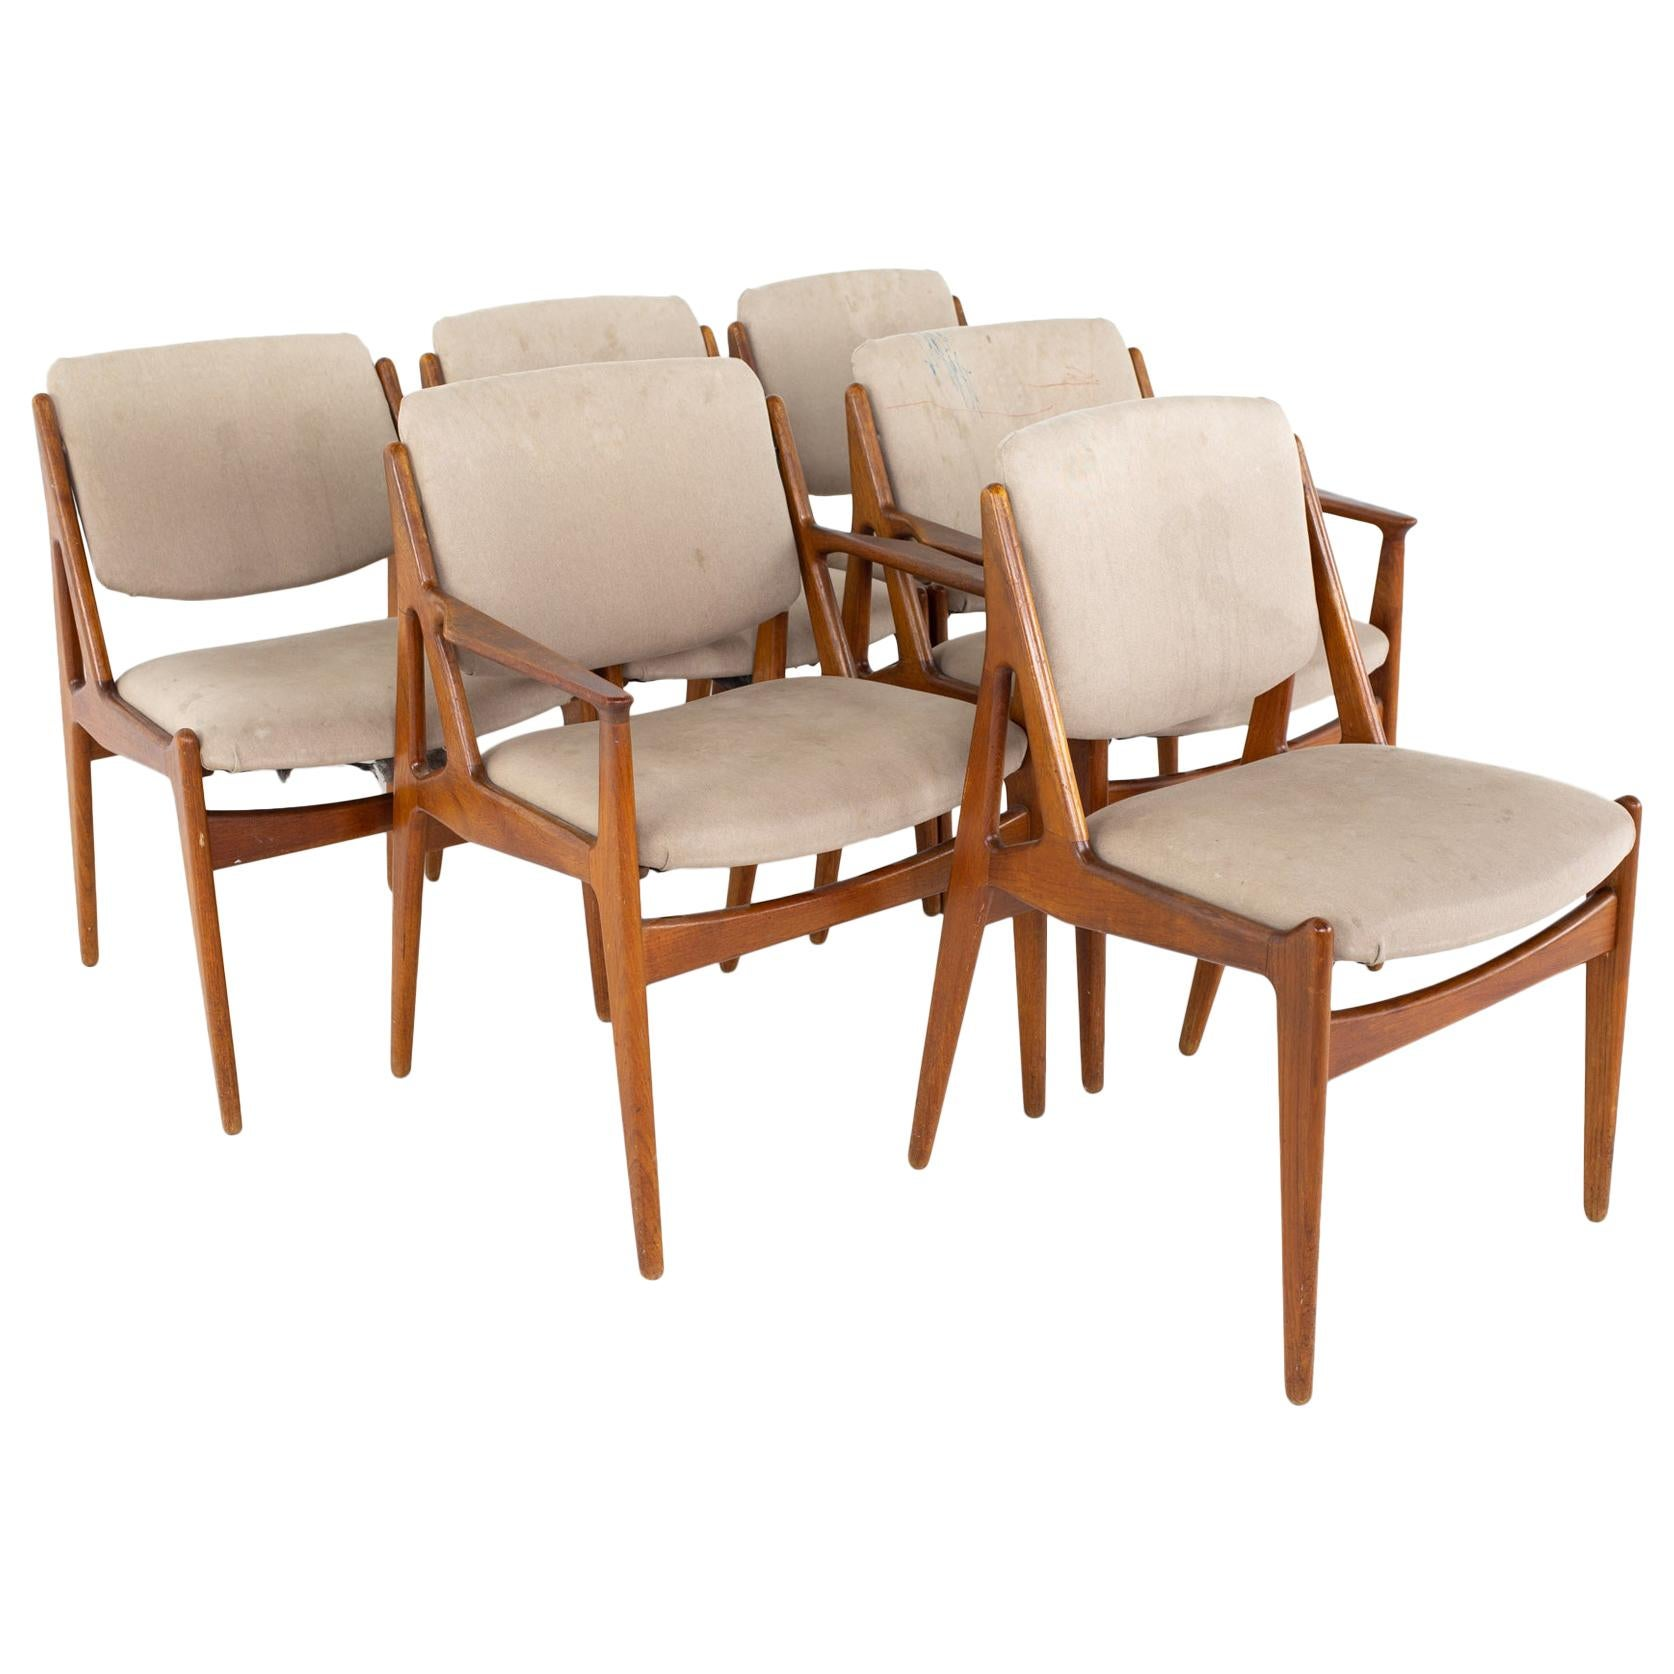 Arne Vodder Mid Century Teak Dining Chairs, Set of 6